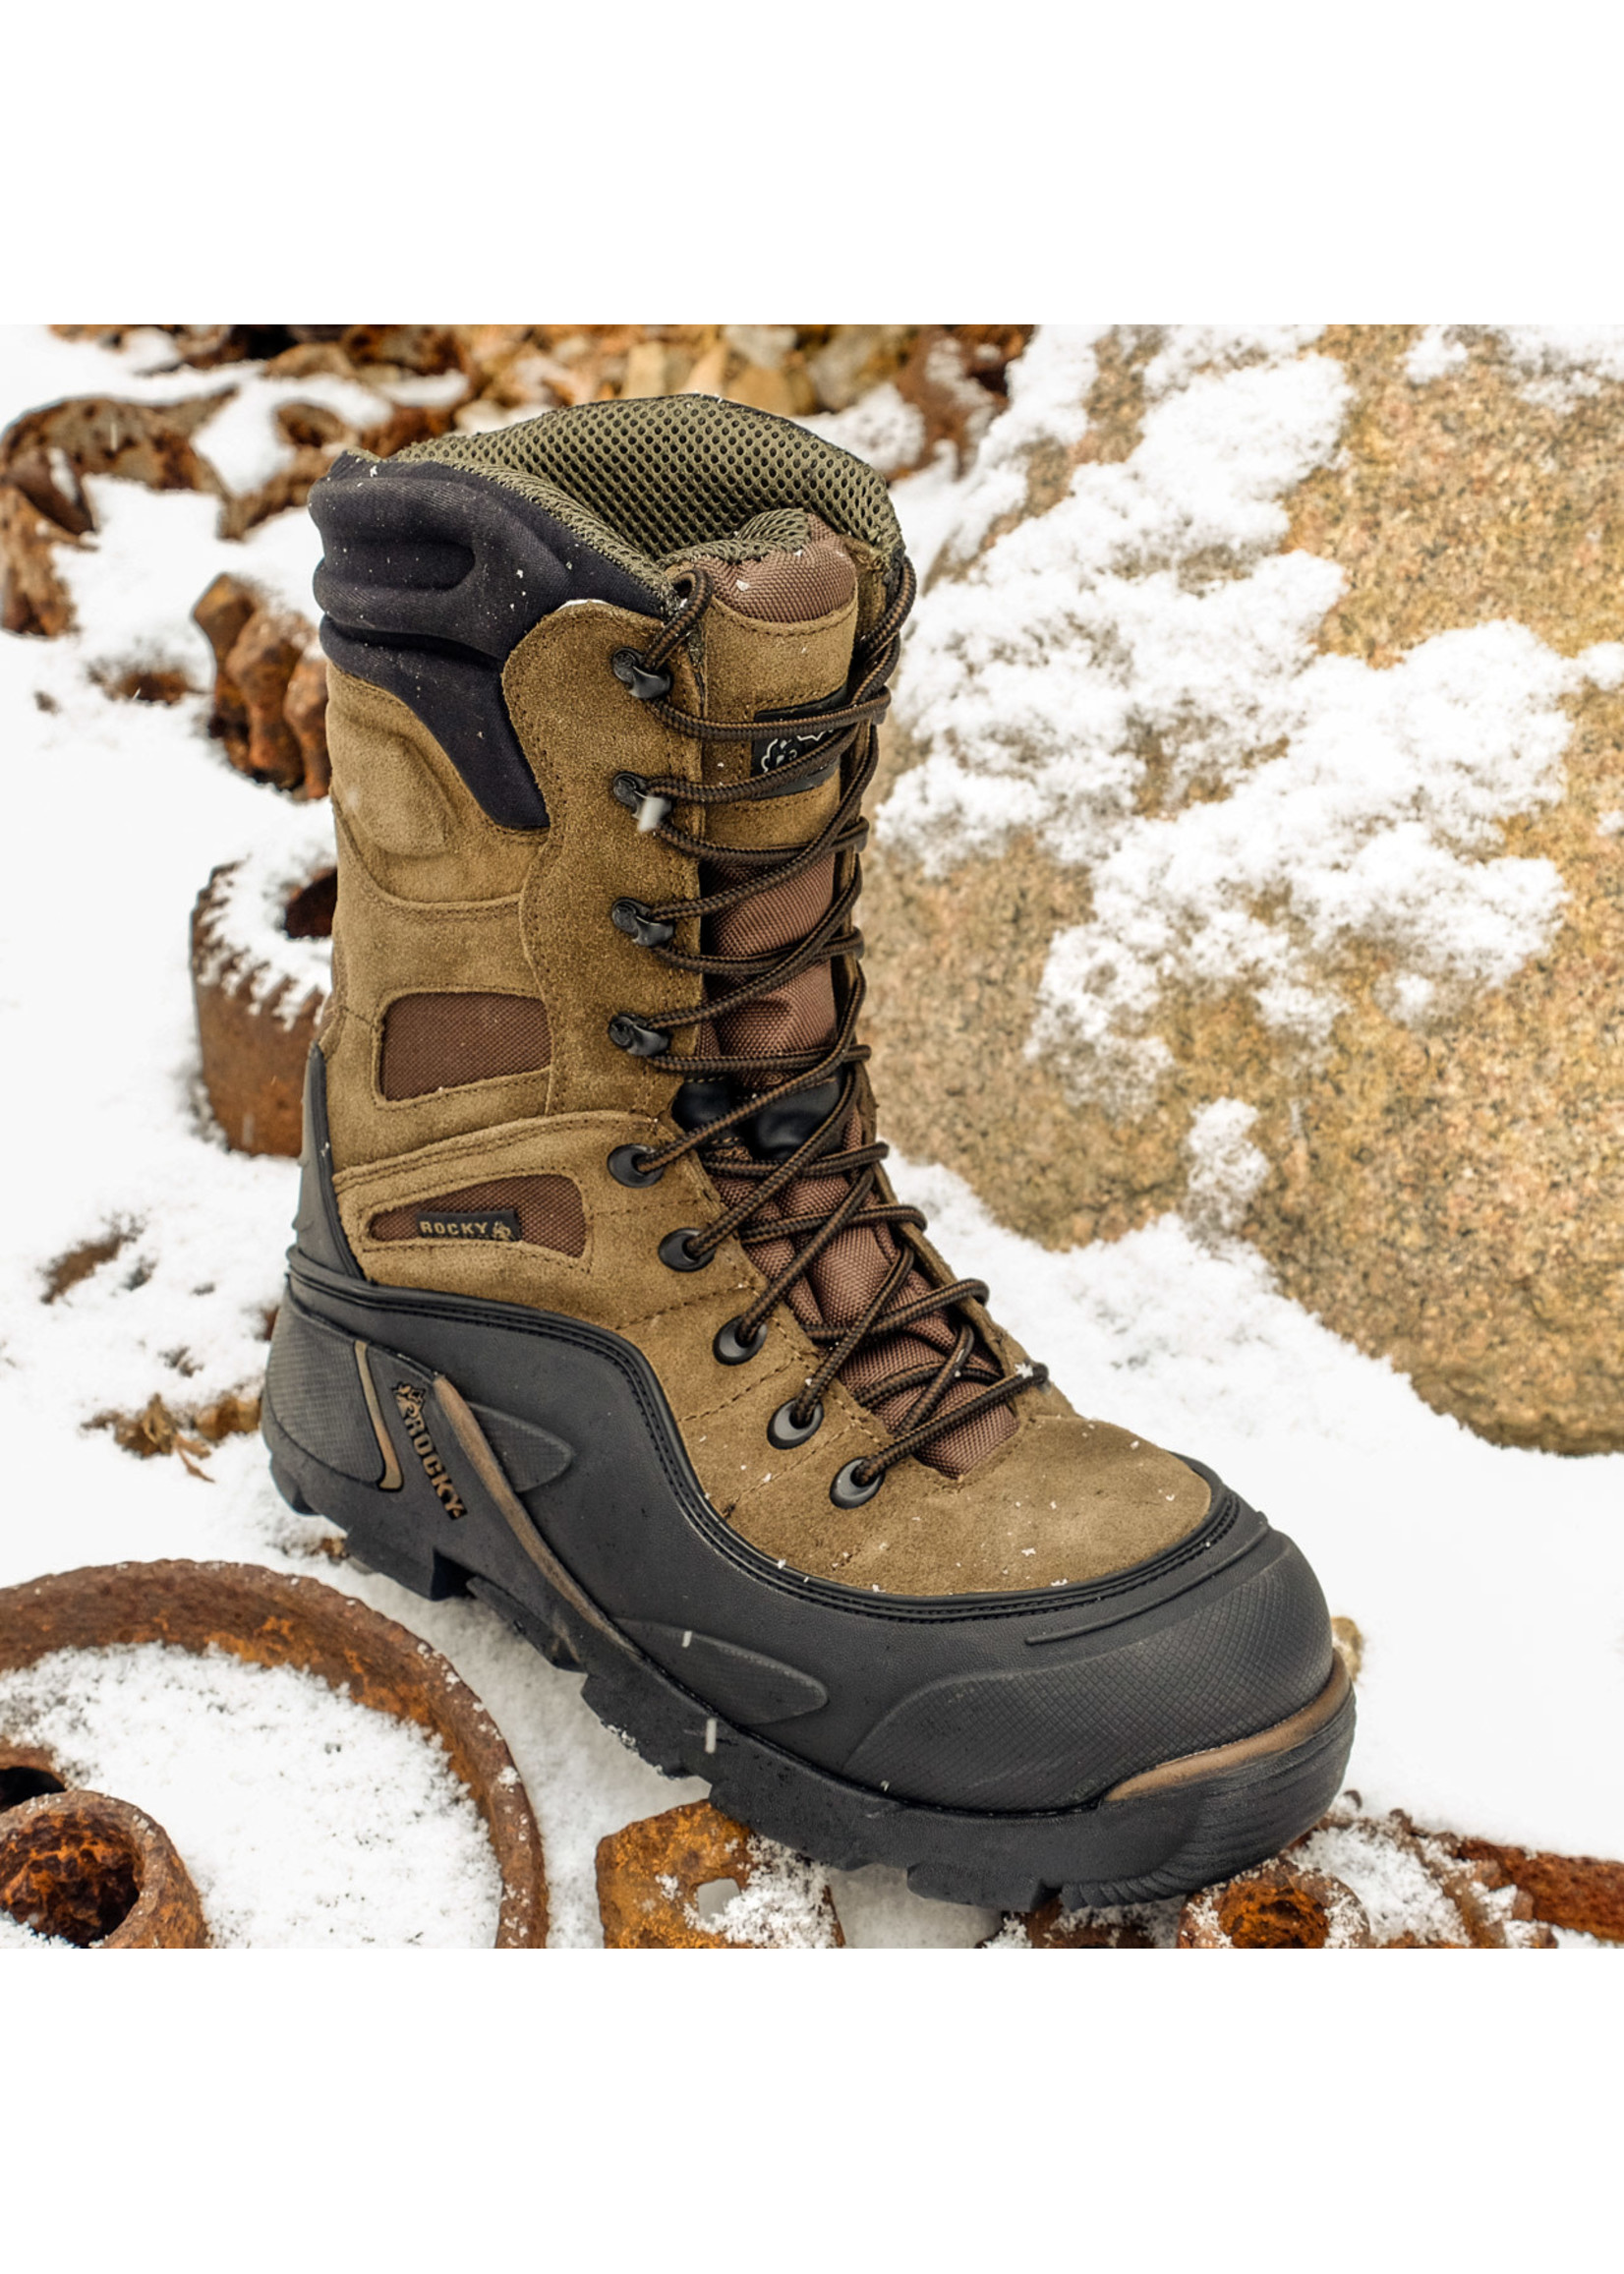 "Rocky Blizzard Stalker 7465 Insulated 9"" Steel Toe Work Boot"